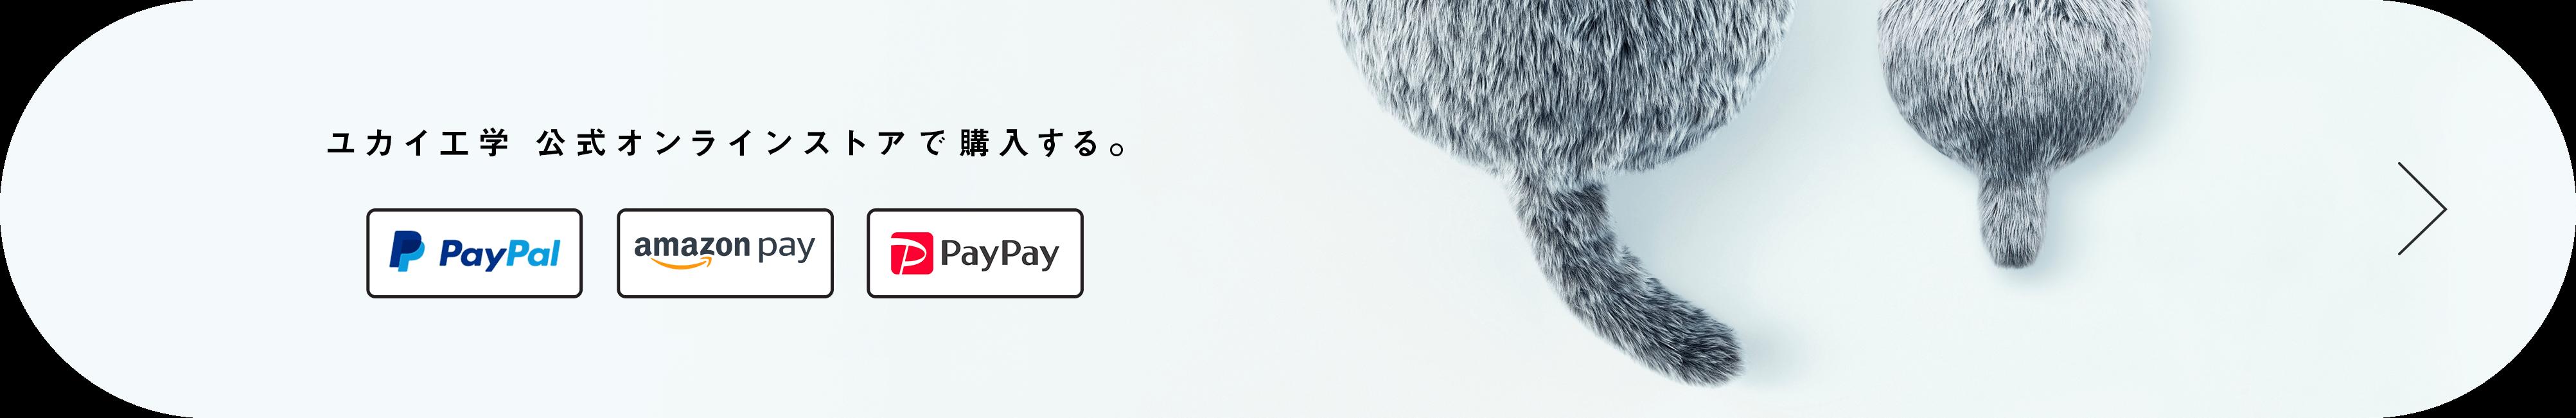 Qoobo(クーボ)・Petit Qoobo(プチ・クーボ)をユカイ工学 公式オンラインストアで購入する。